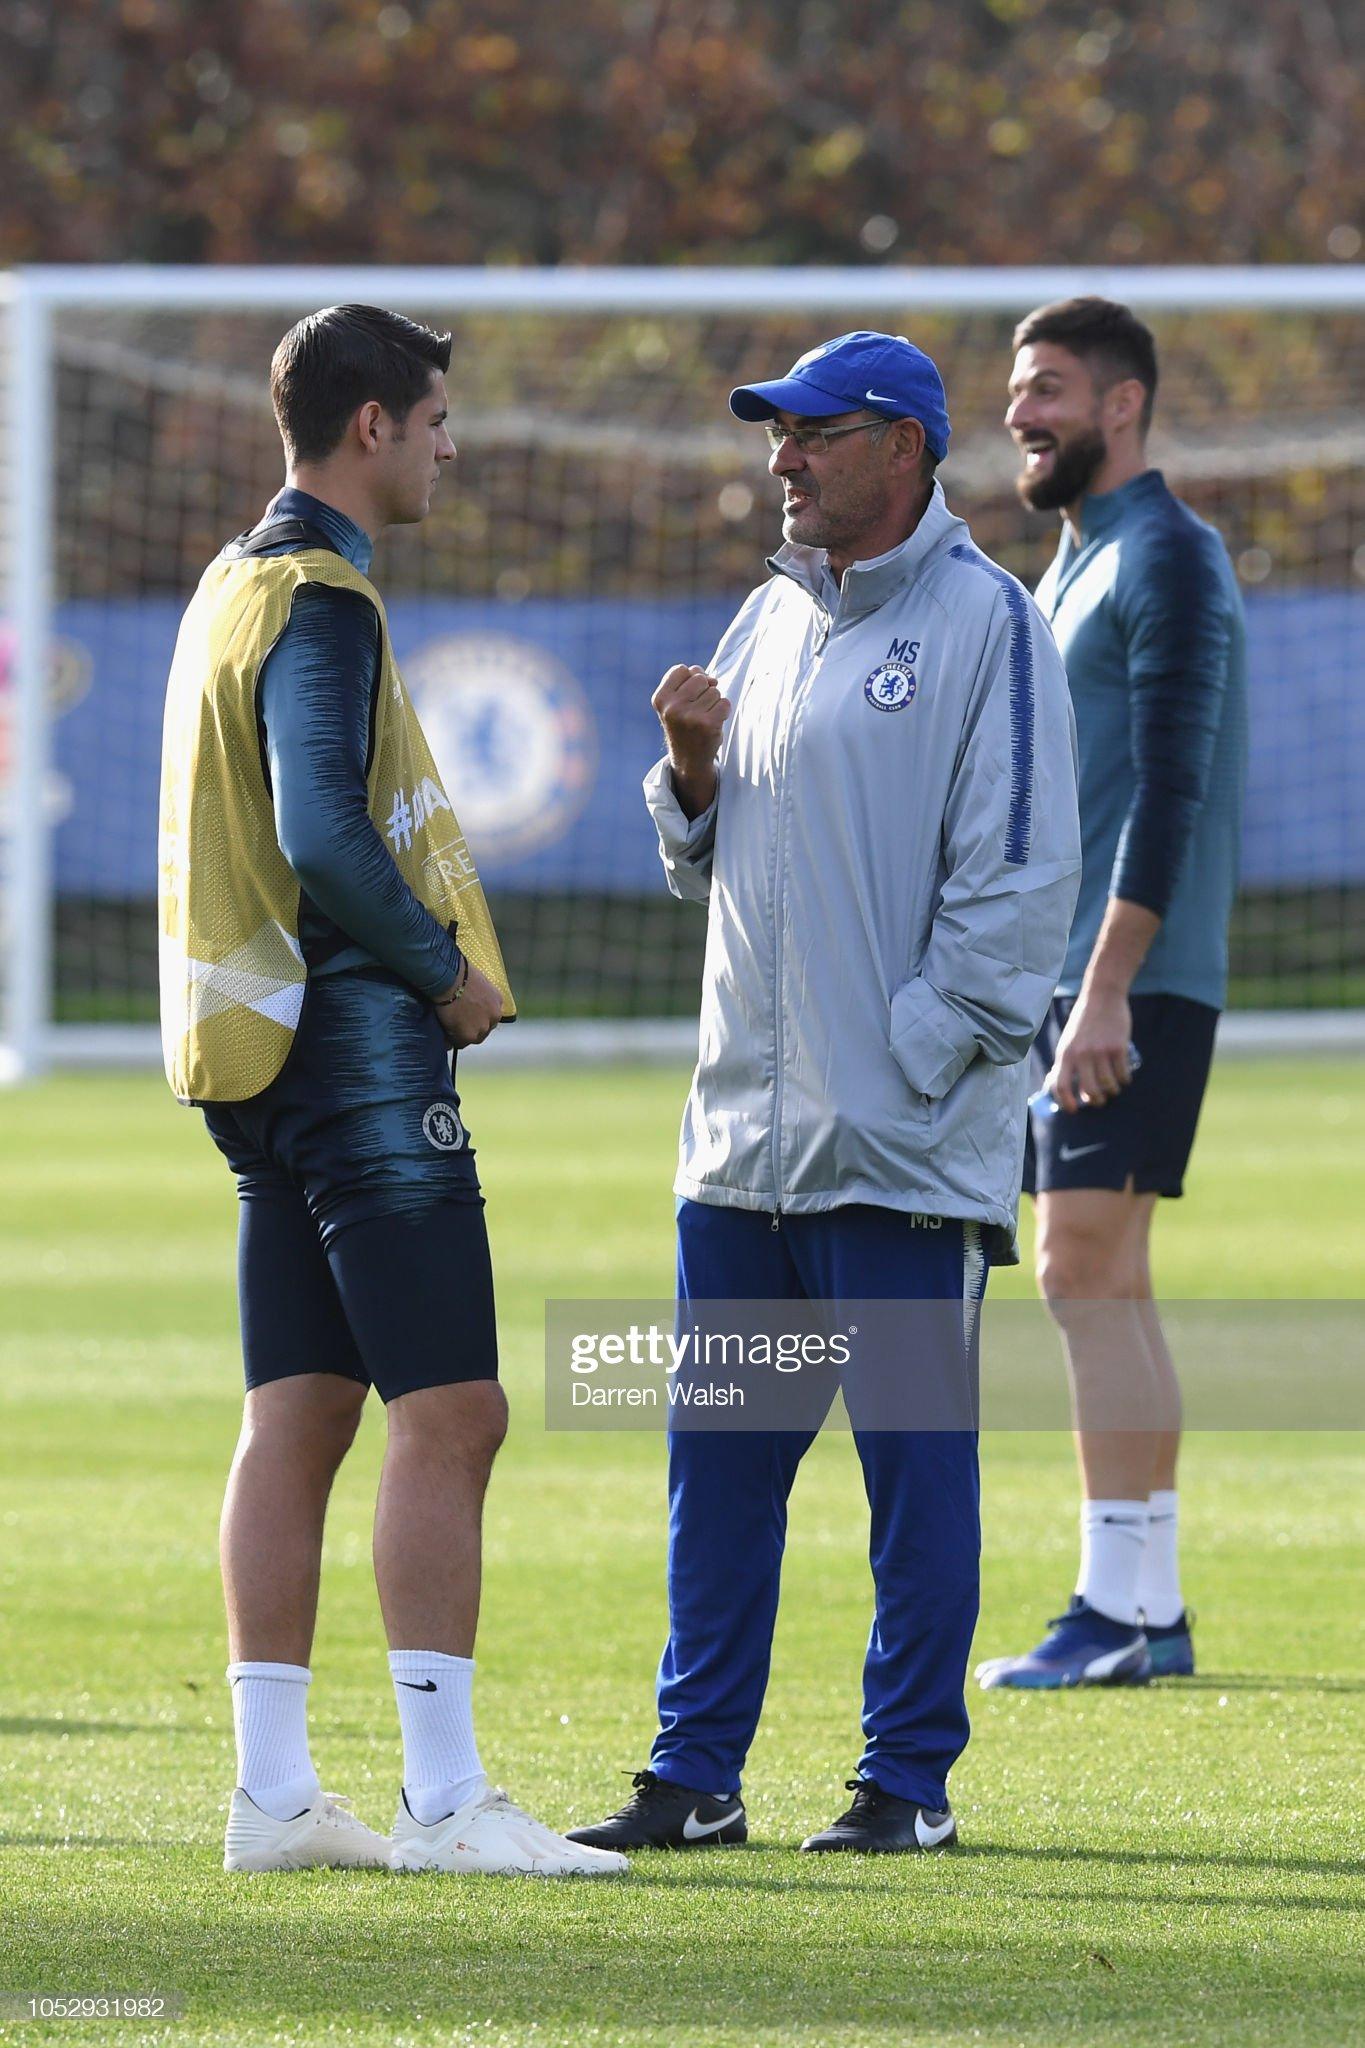 ¿Cuánto mide Maurizio Sarri? - Altura - Real height Alvaro-morata-and-maurizio-sarri-of-chelsea-talk-during-a-training-picture-id1052931982?s=2048x2048